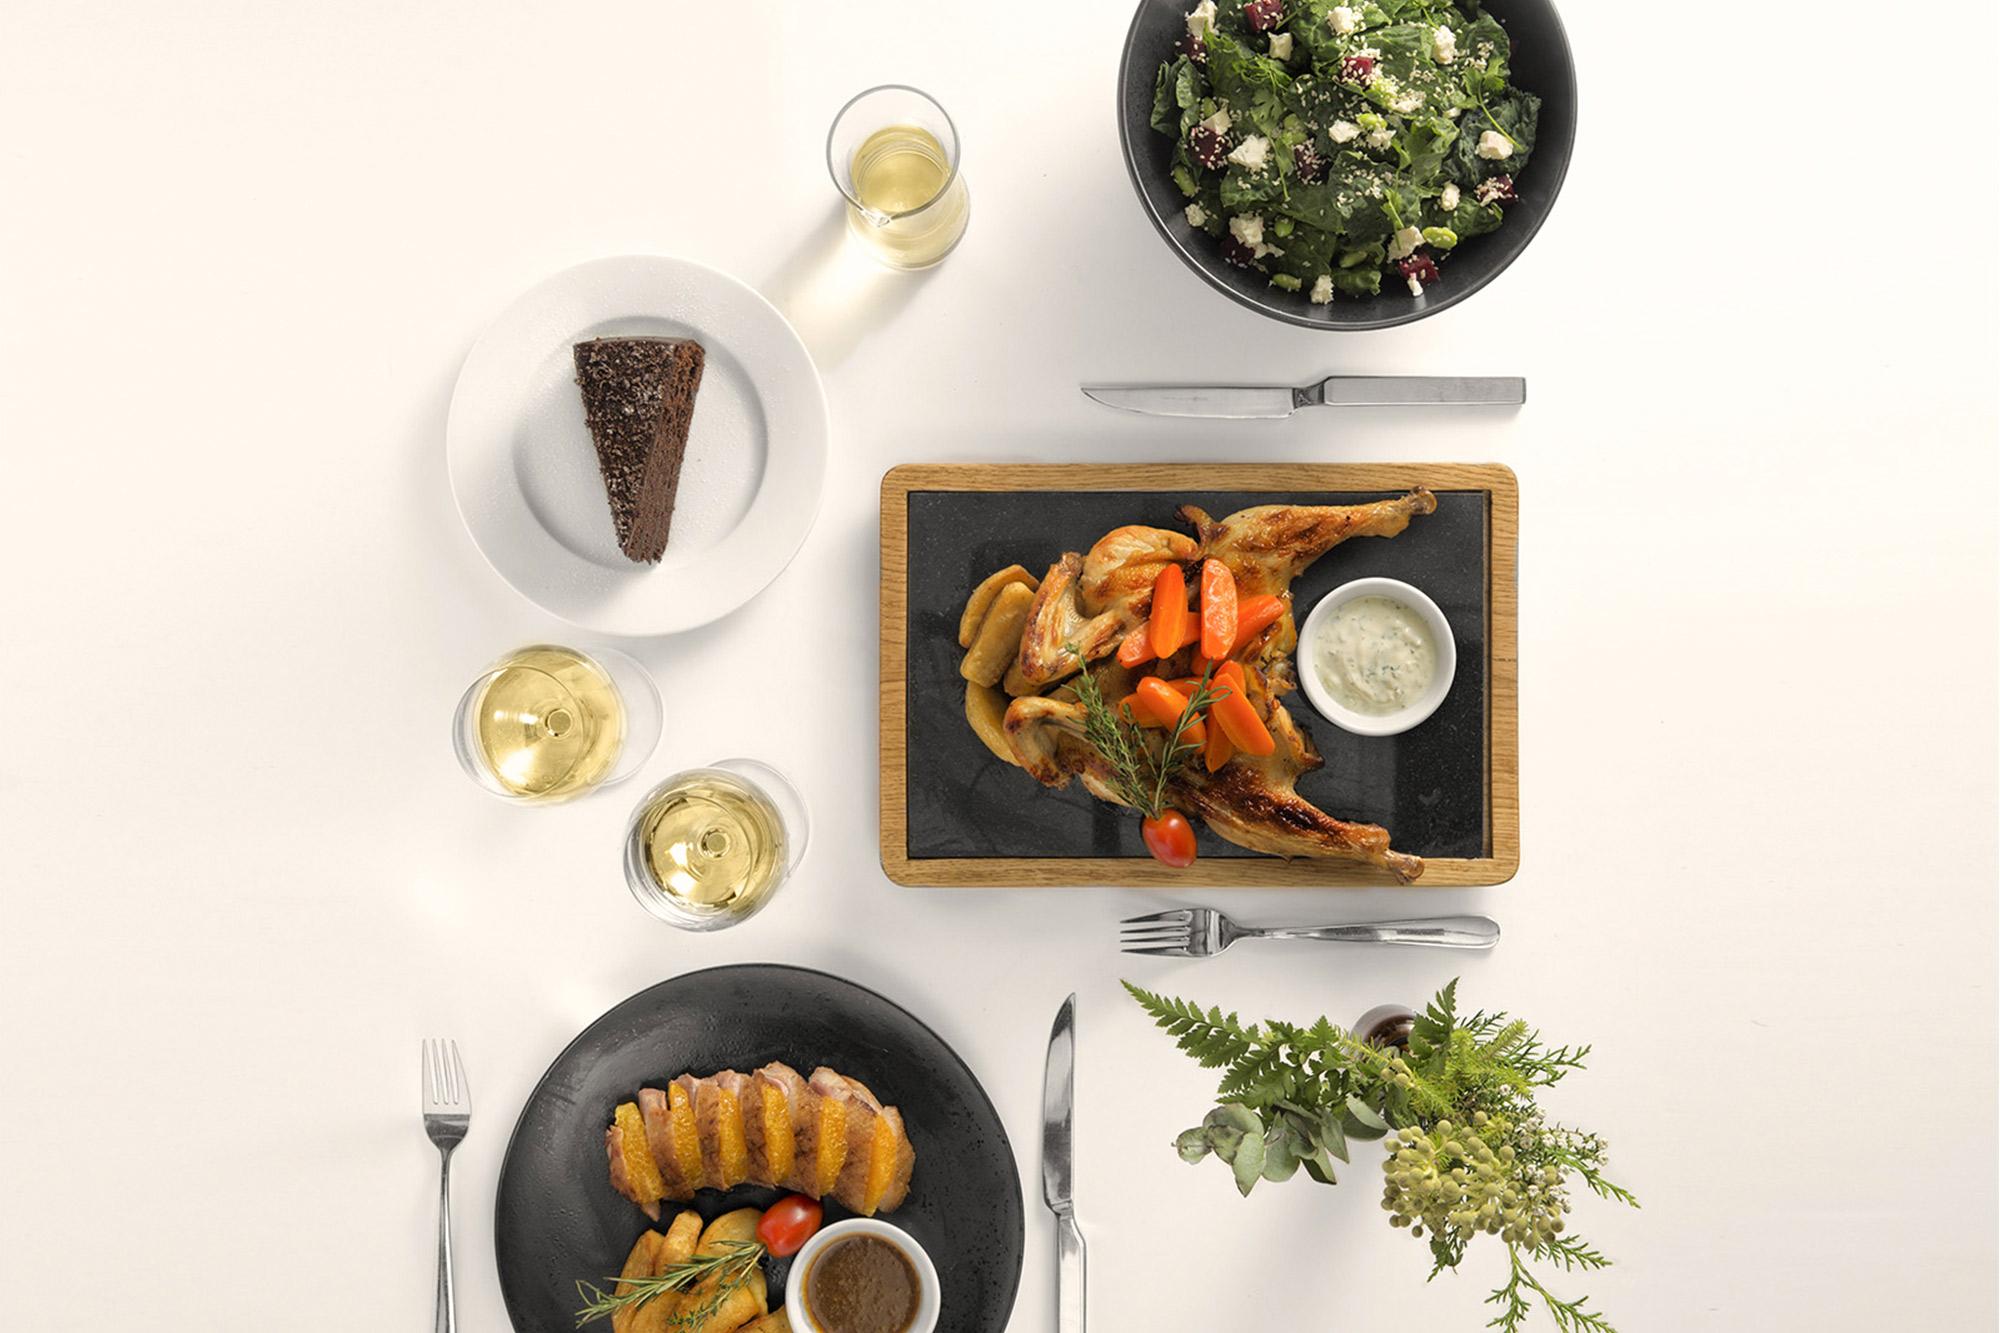 L'Usine Eatery: A Concept Setting The Culinary Tone For The New Saigon